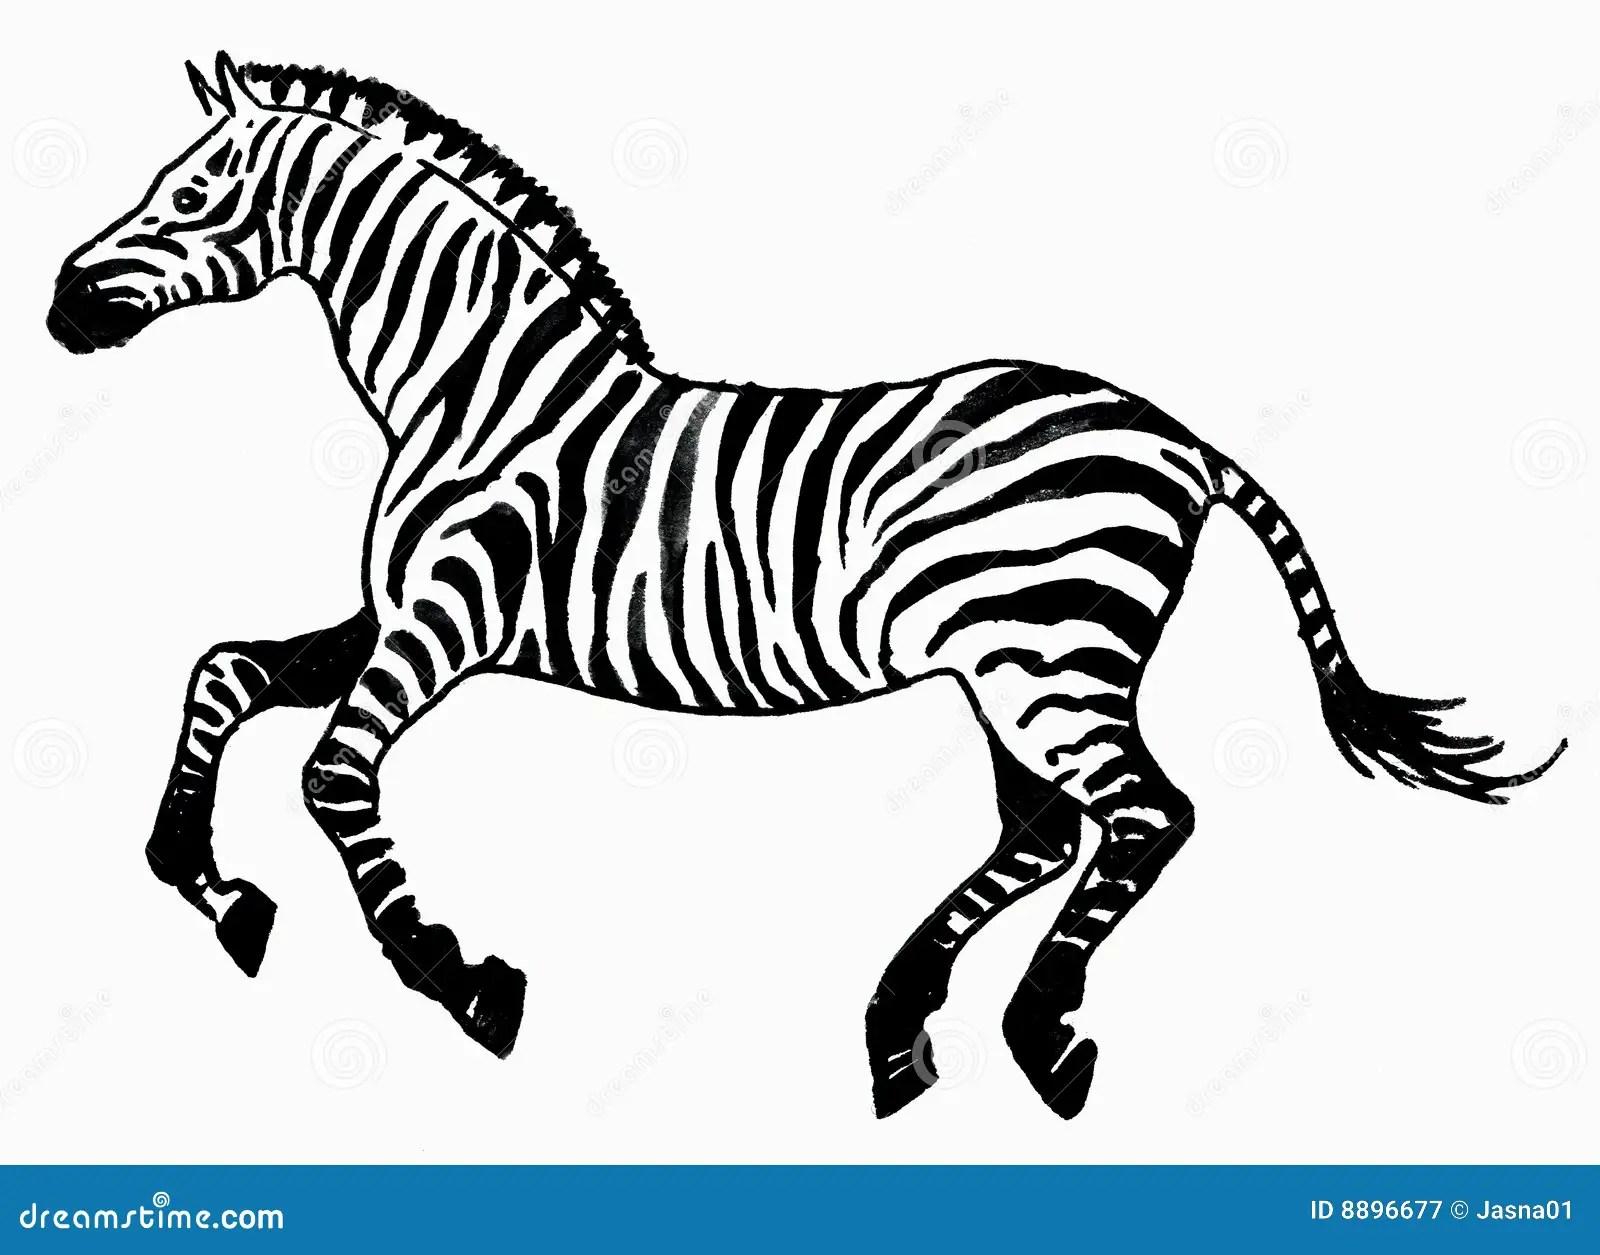 Zebra Animal Royalty Free Stock Photography